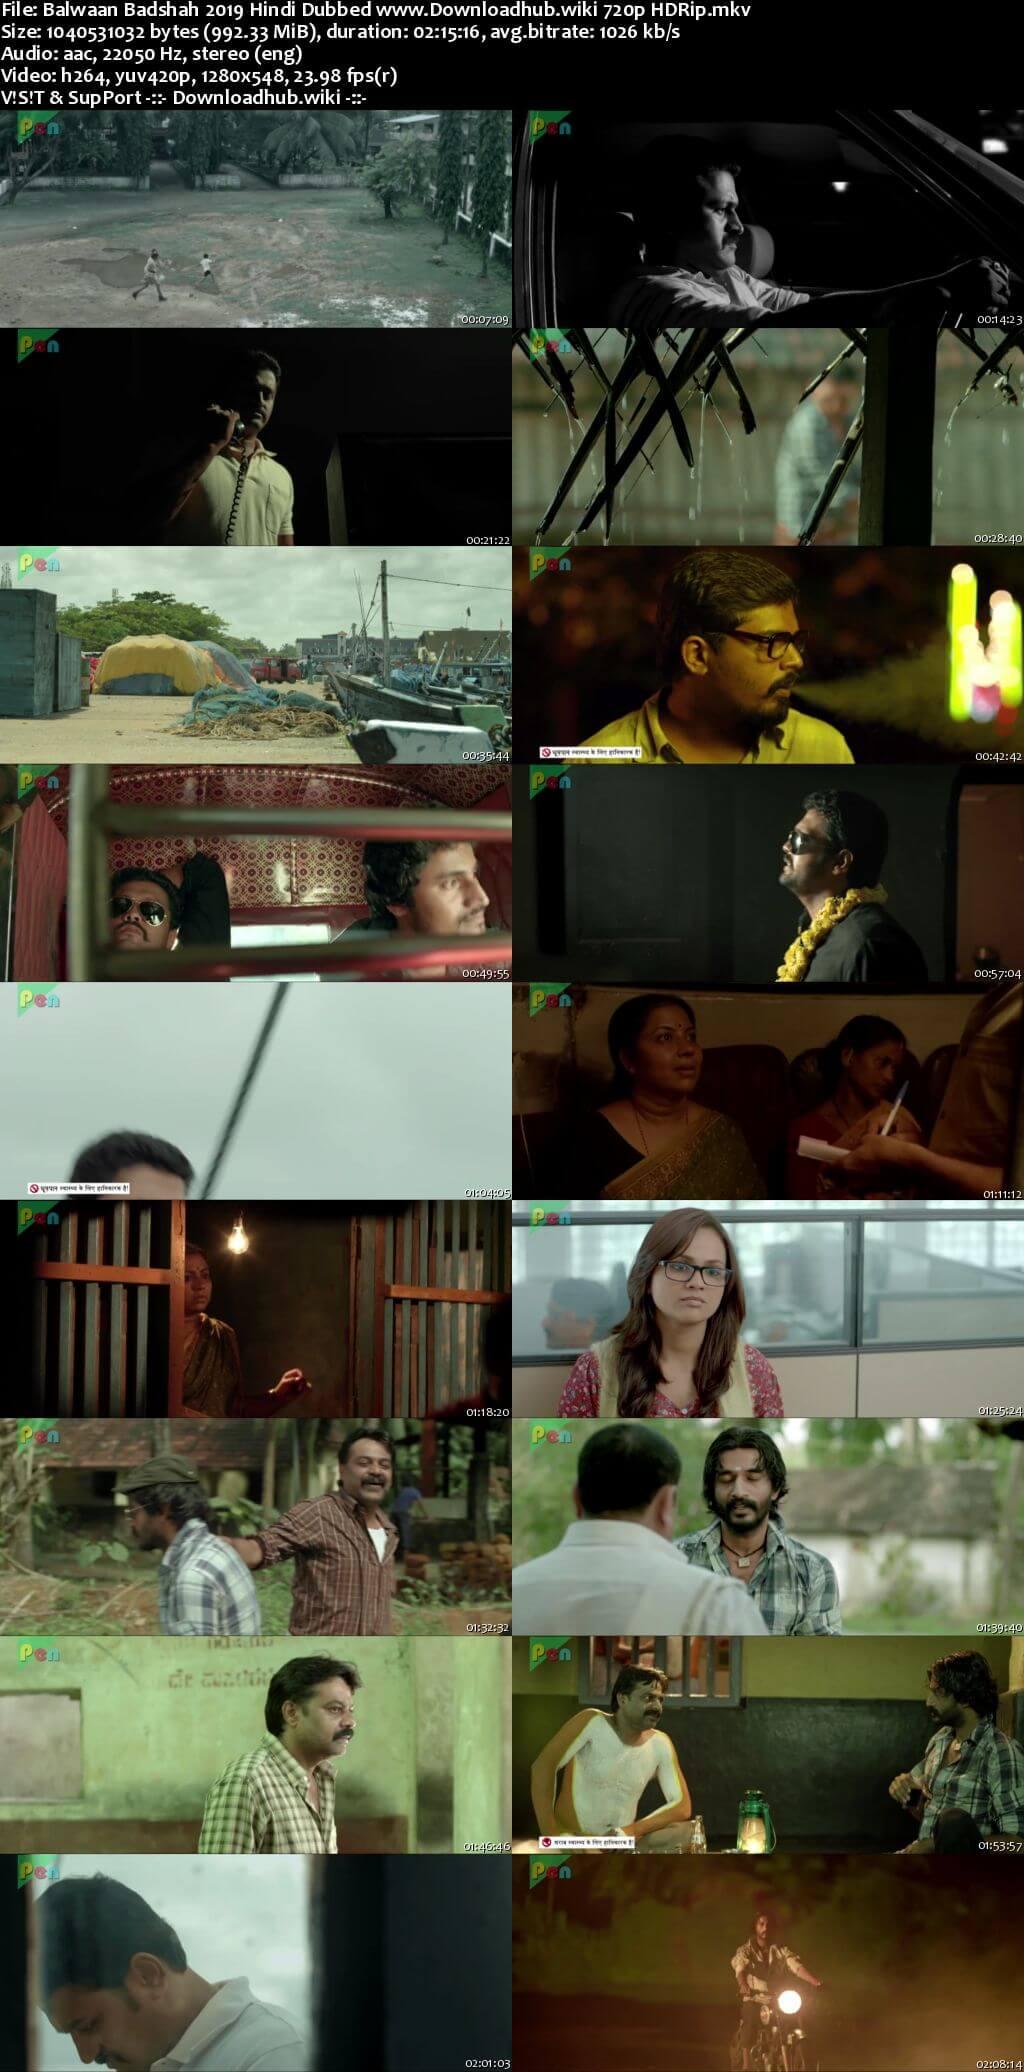 Balwaan Badshah 2019 Hindi Dubbed 720p HDRip x264